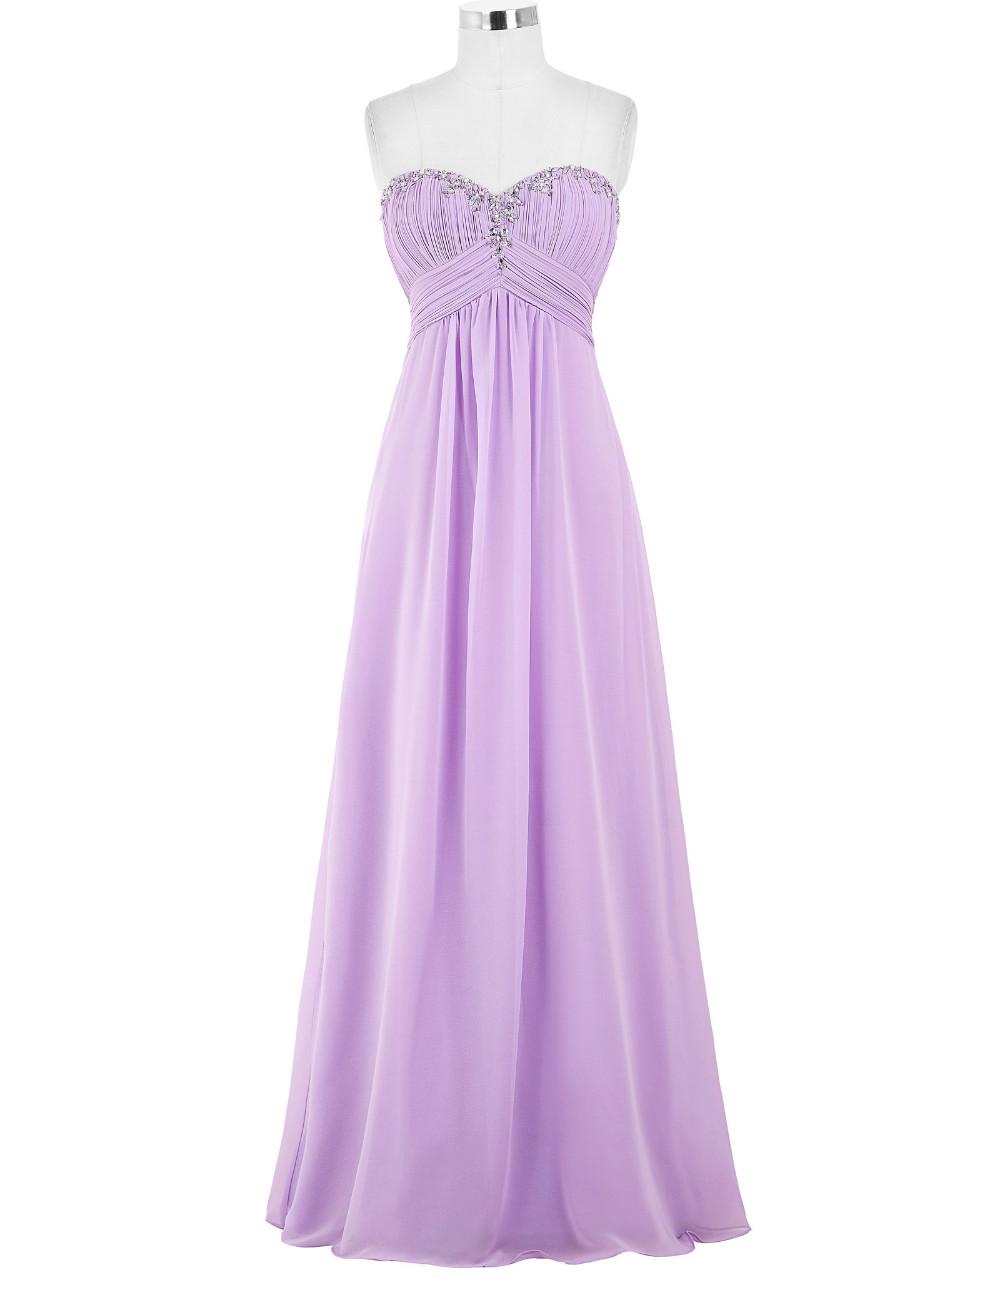 Lavender Green Blue Bridesmaid Dresses Long Wedding Party Dress Bruidsmeisjes Jurk Chiffon Gelinlik Prom Dresses for Bridesmaids 5